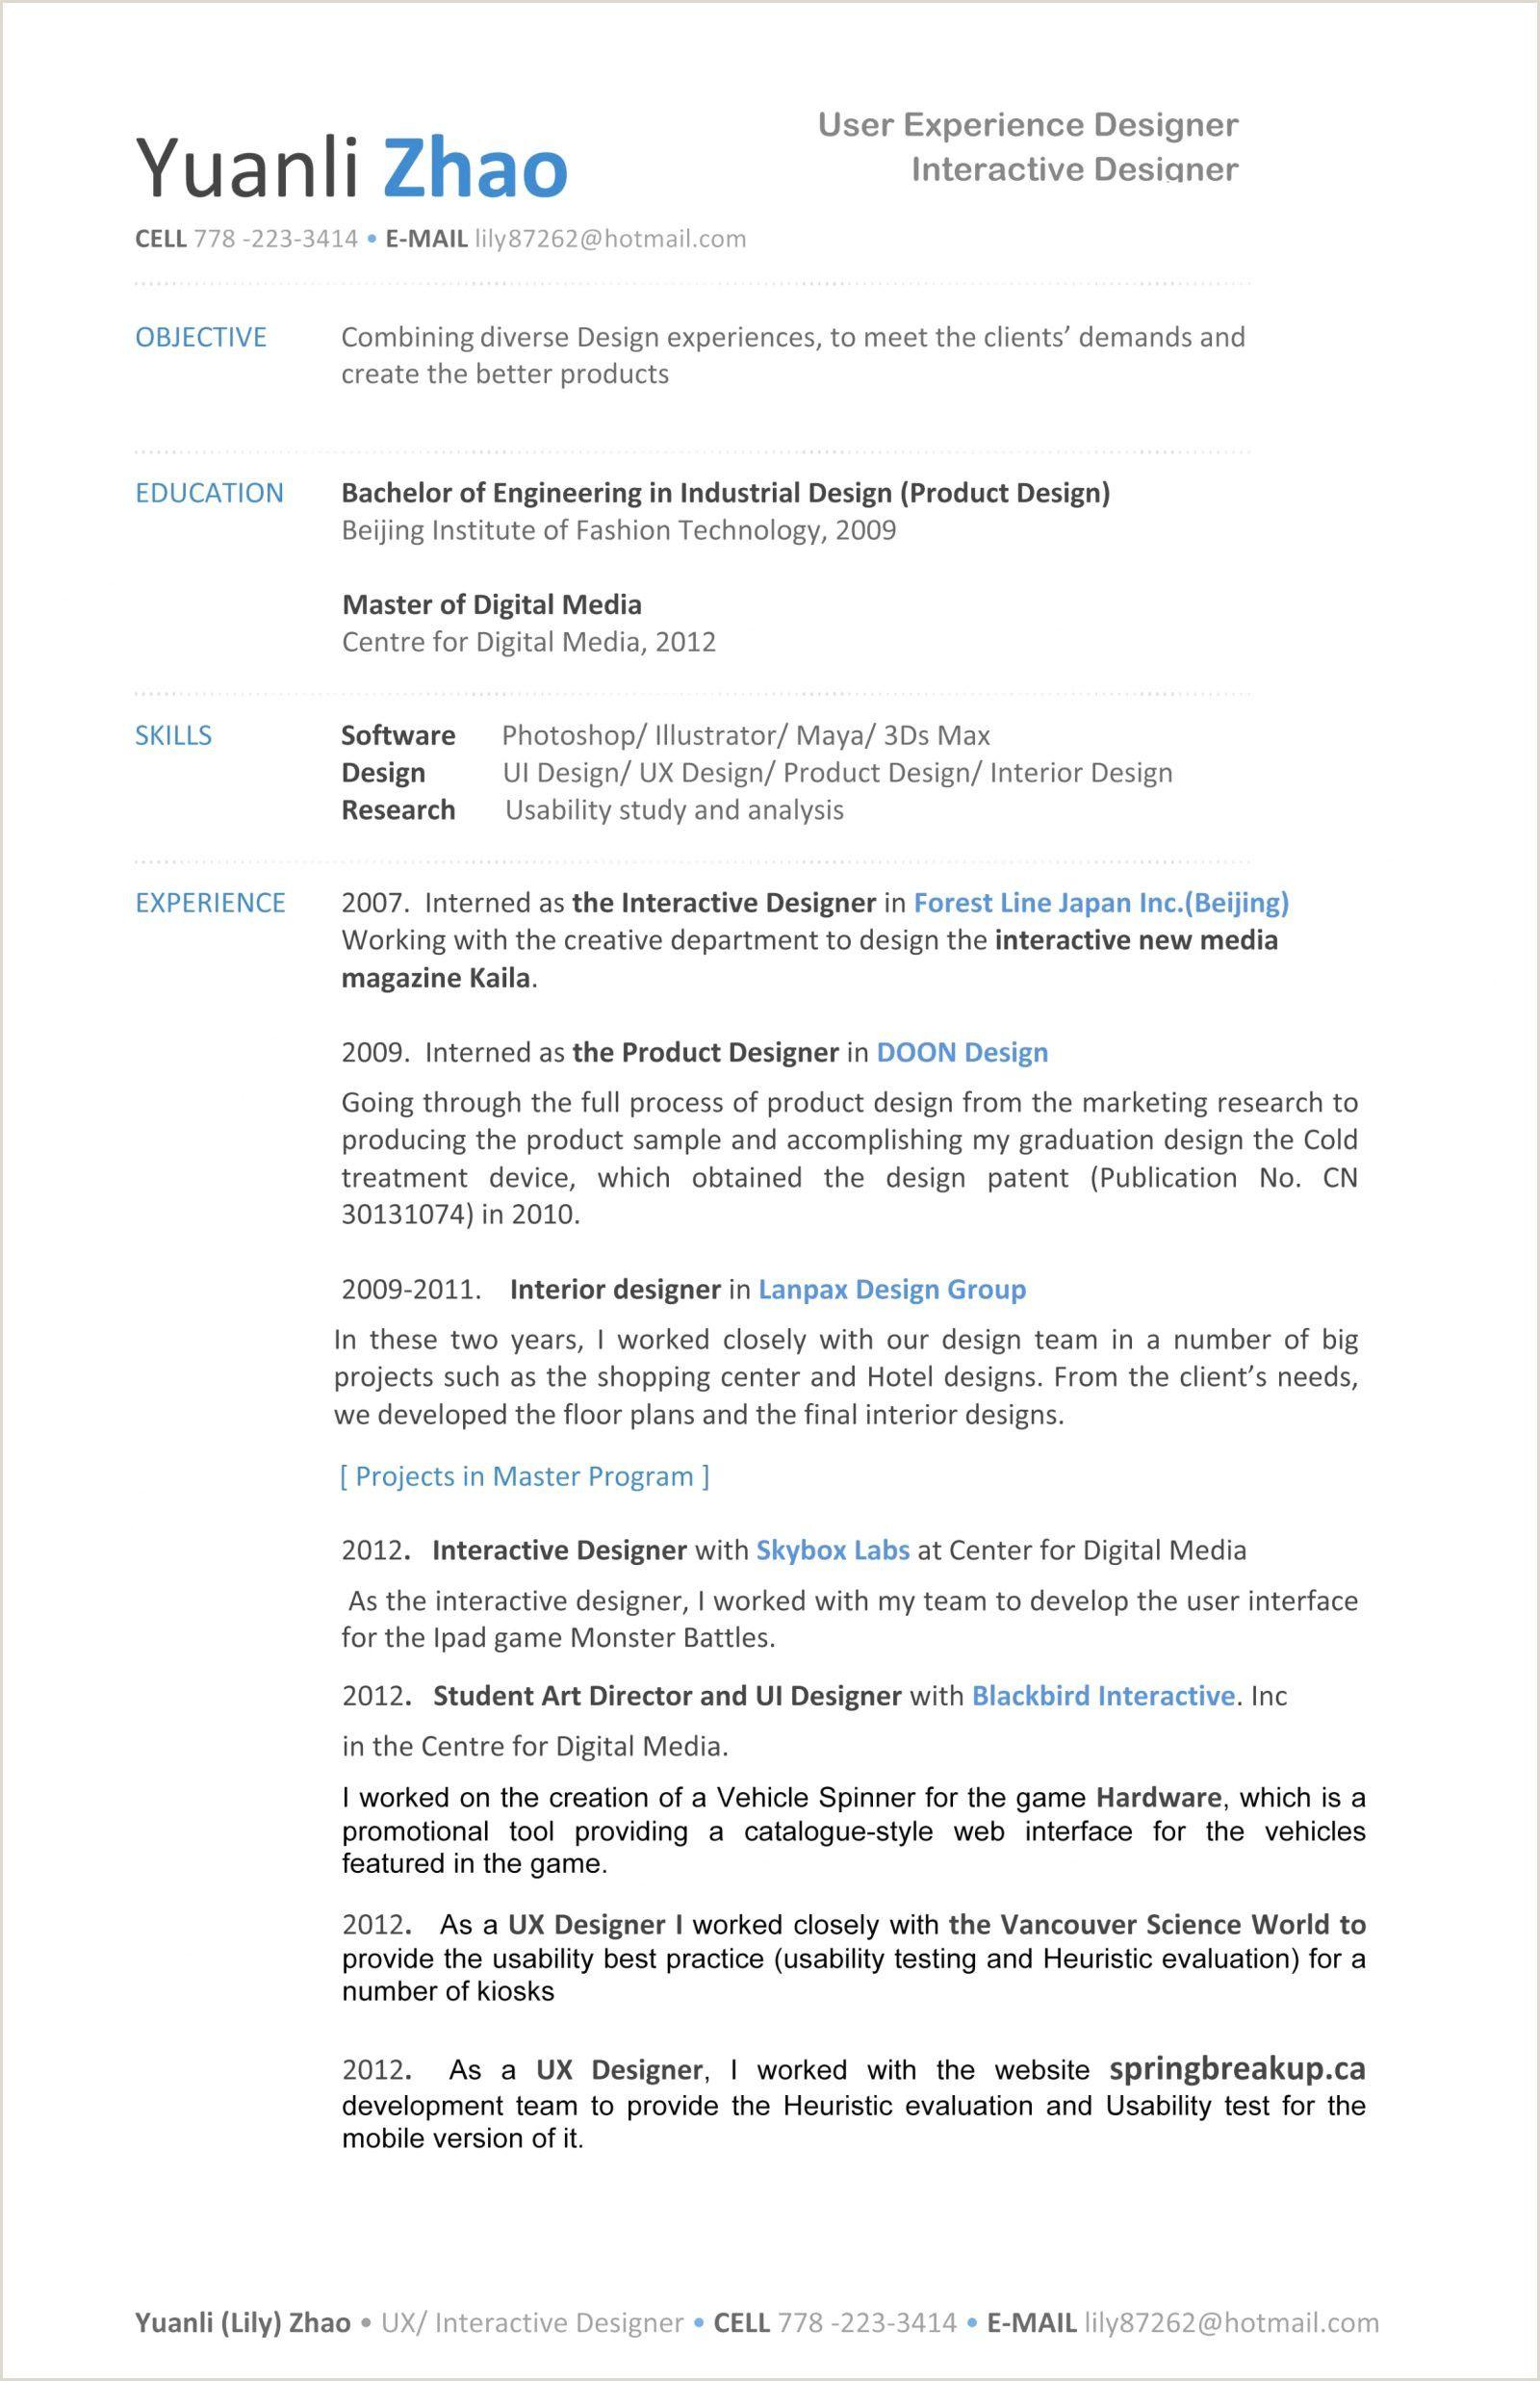 Ux Designer Cover Letter Sample In 2020 Cover Letter Sample Resume Cover Letter Examples Letter Sample